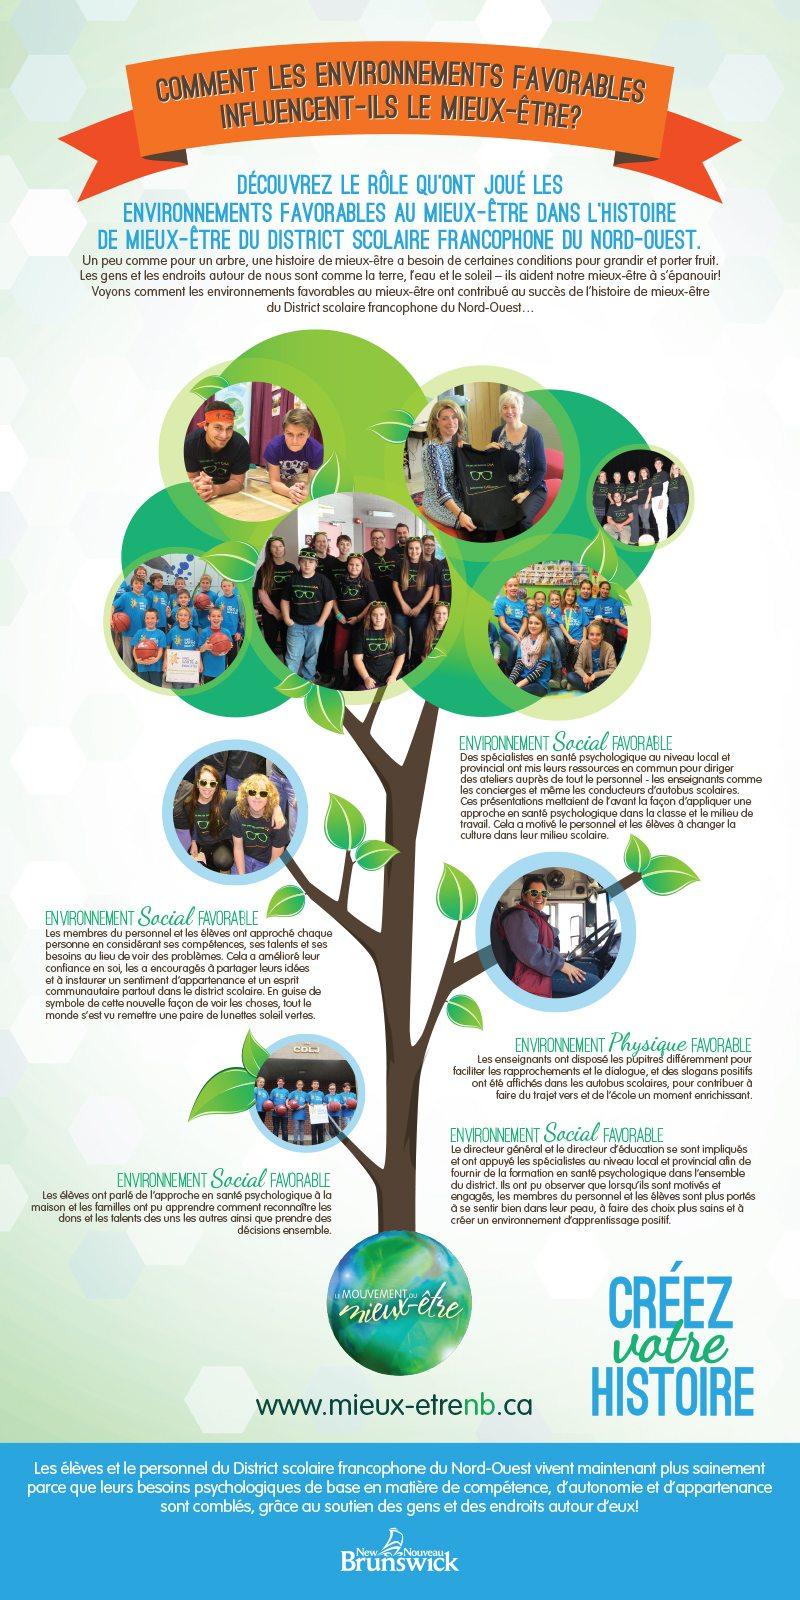 14981 NB Wellness infographics-FR - The Wellness Movement | Le